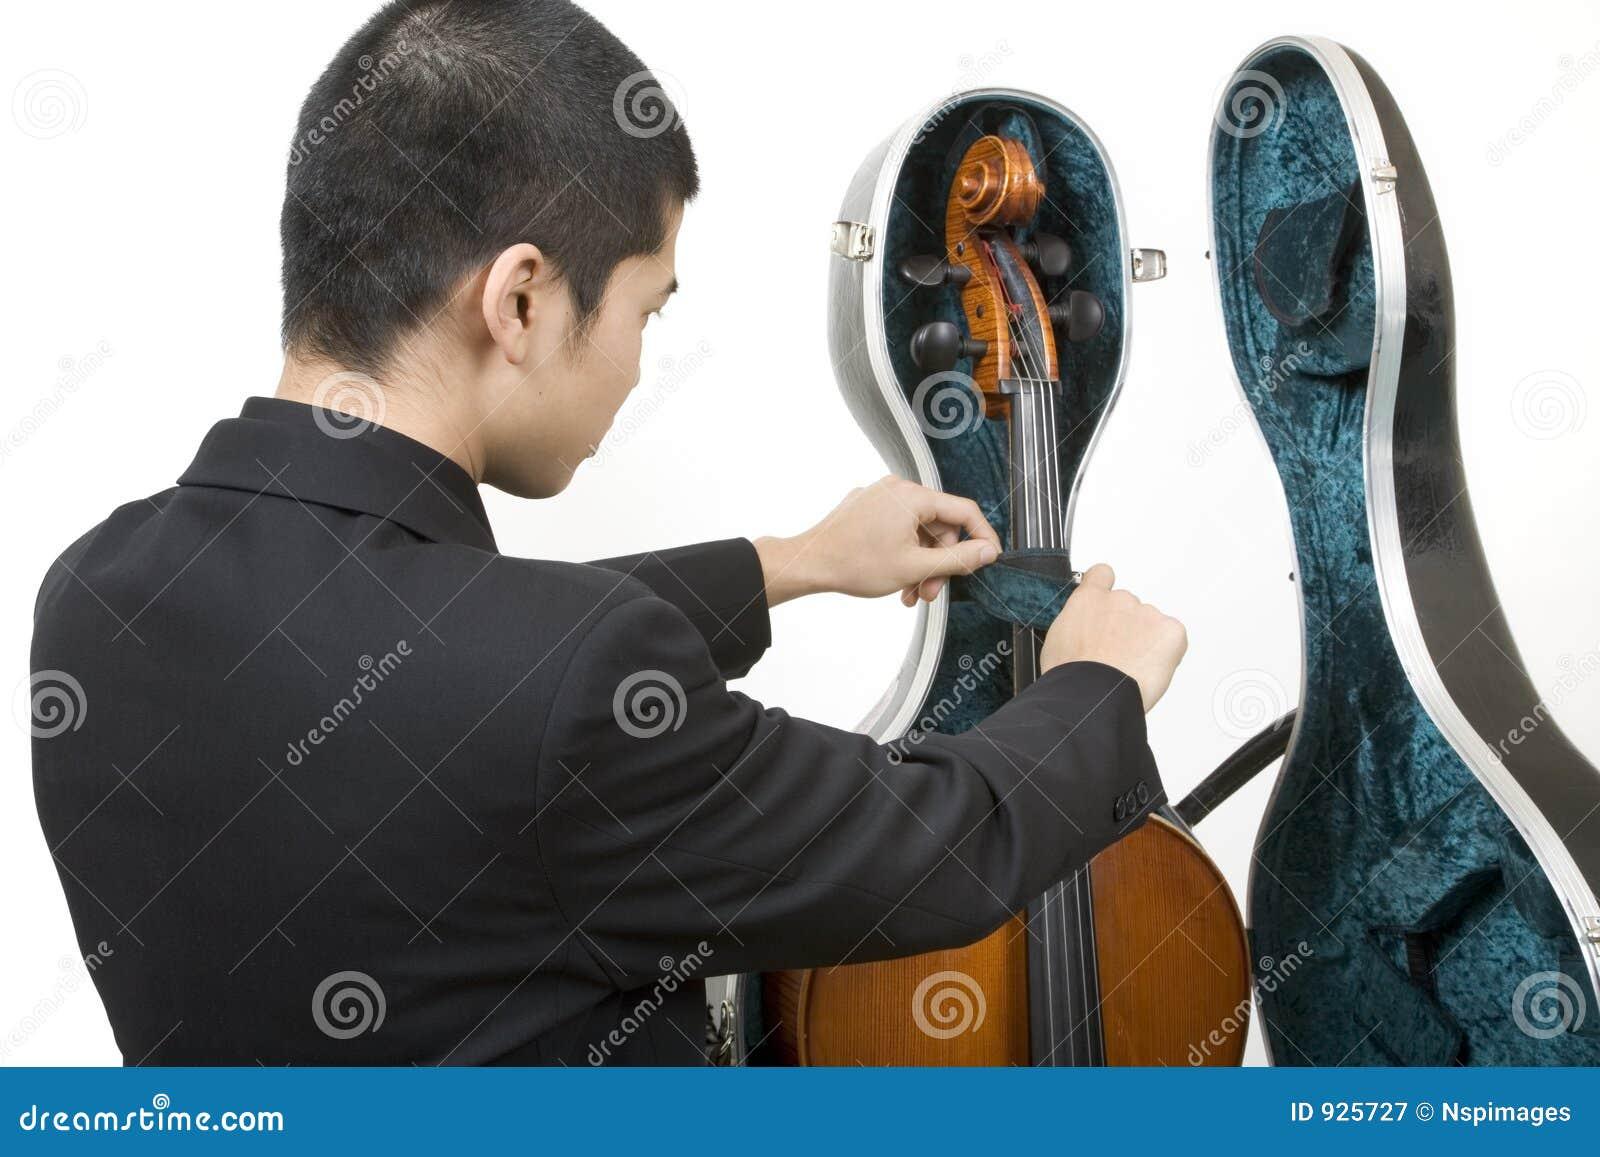 Opening cello case